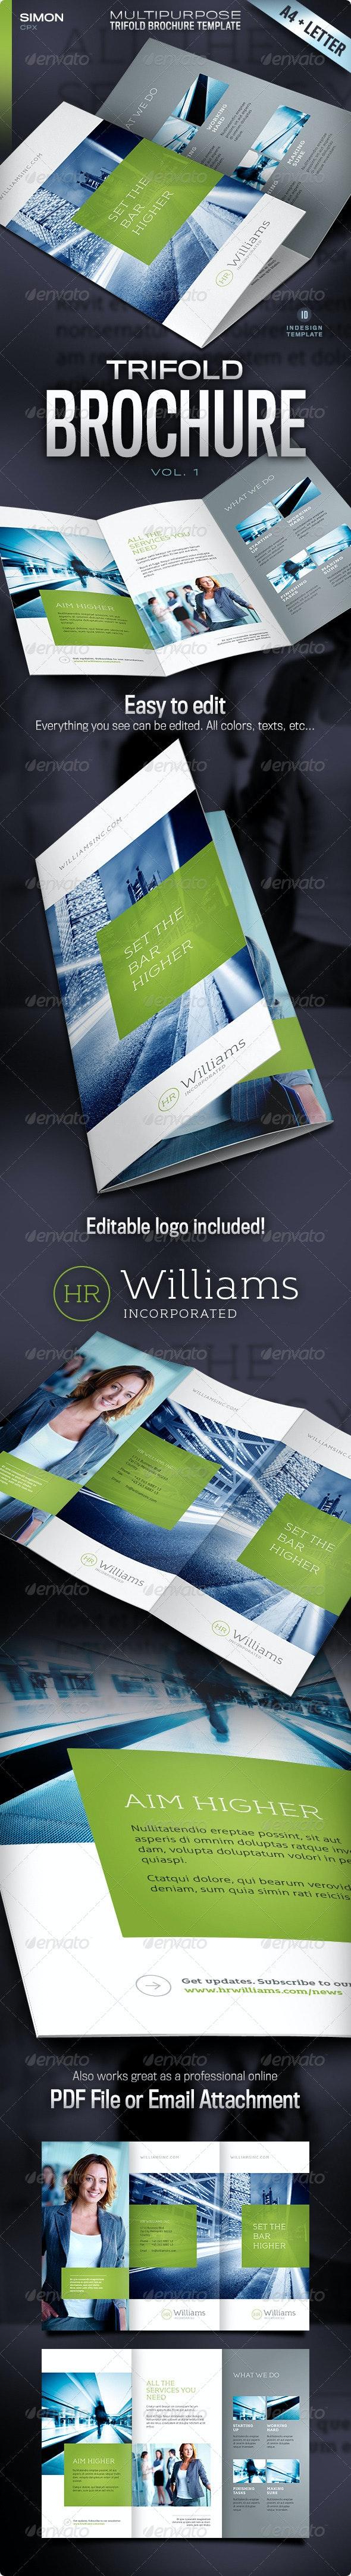 Trifold Brochure - Vol. 1 - Corporate Brochures